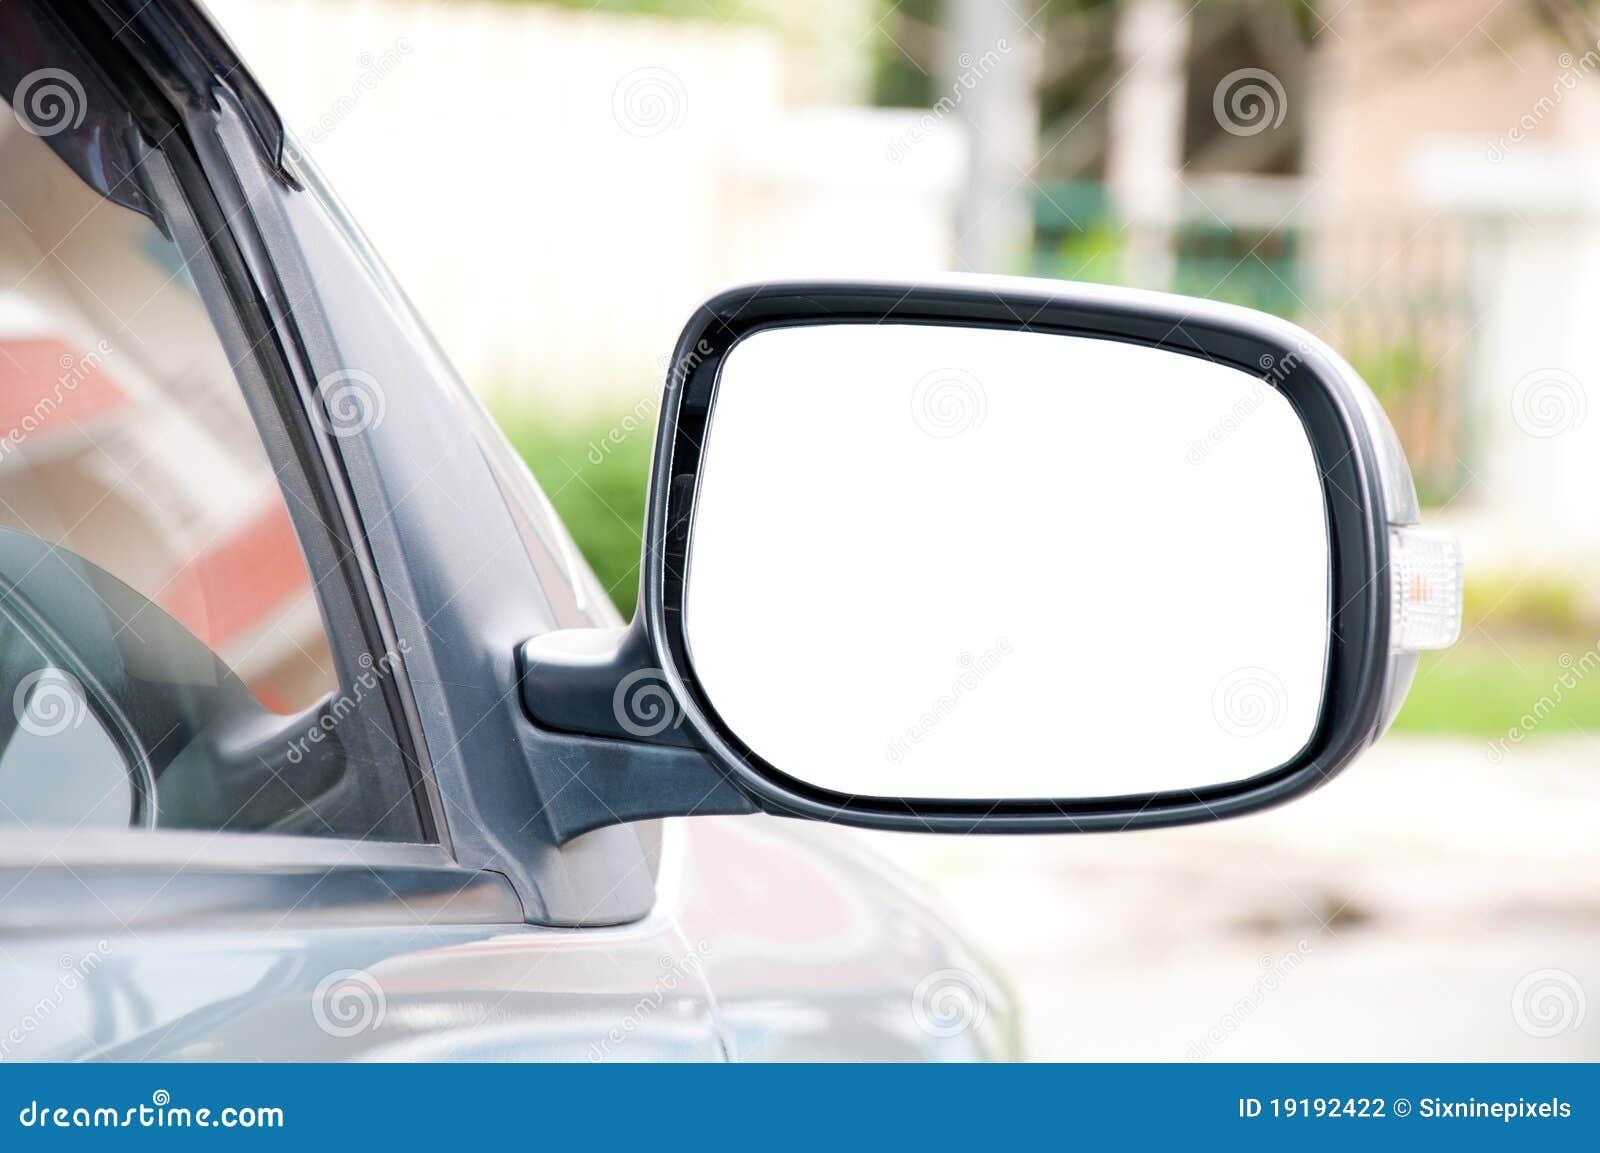 Auto Glass Rear View Mirror